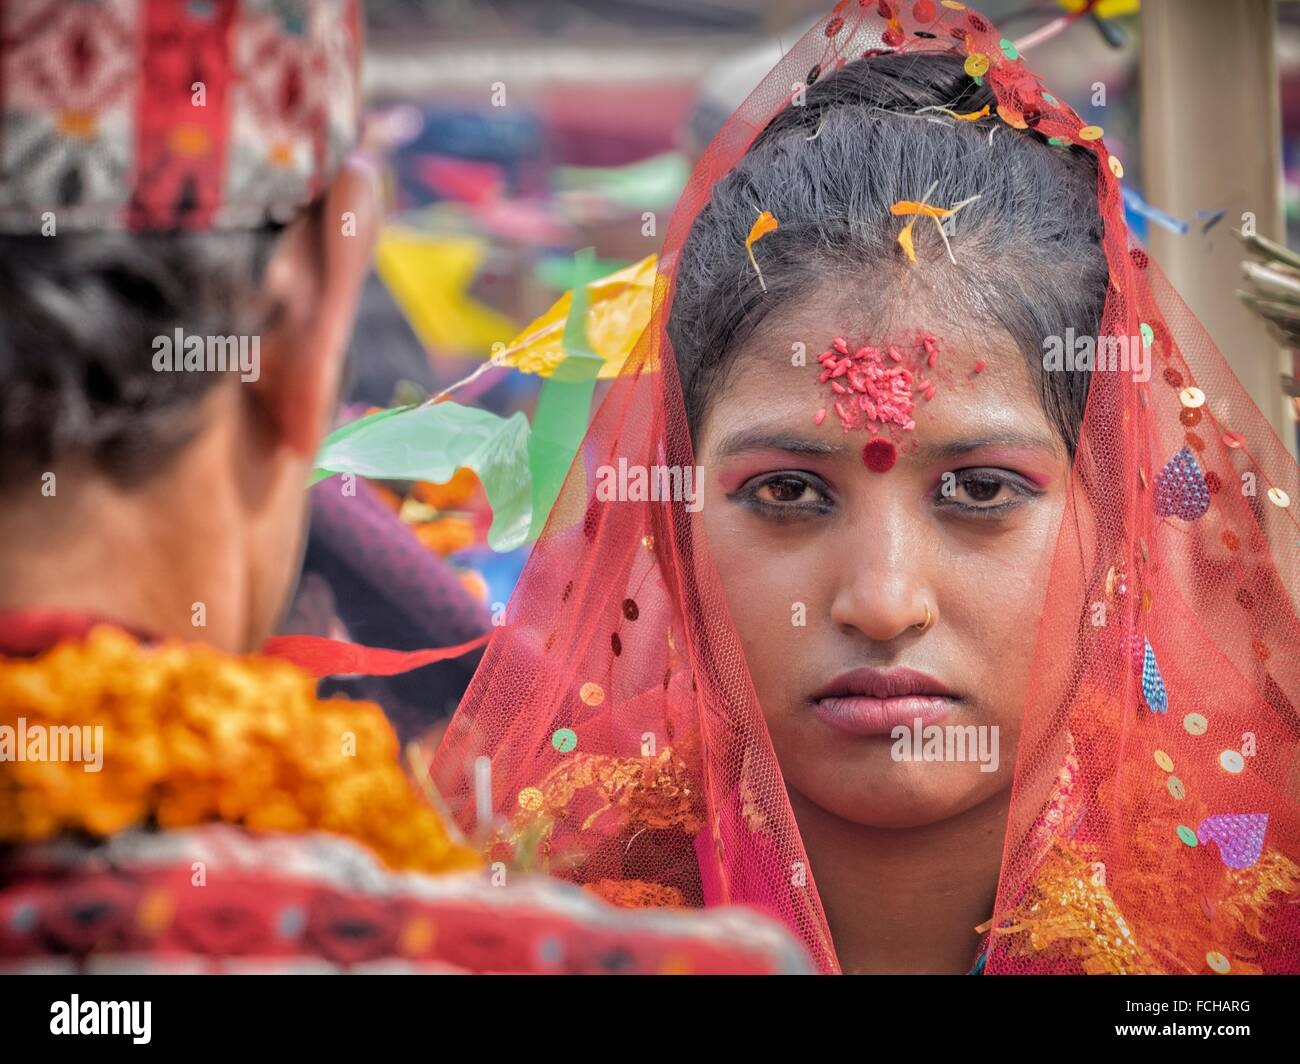 Matrimonio In Nepal : Matrimonio in nepal foto & immagine stock: 93809396 alamy